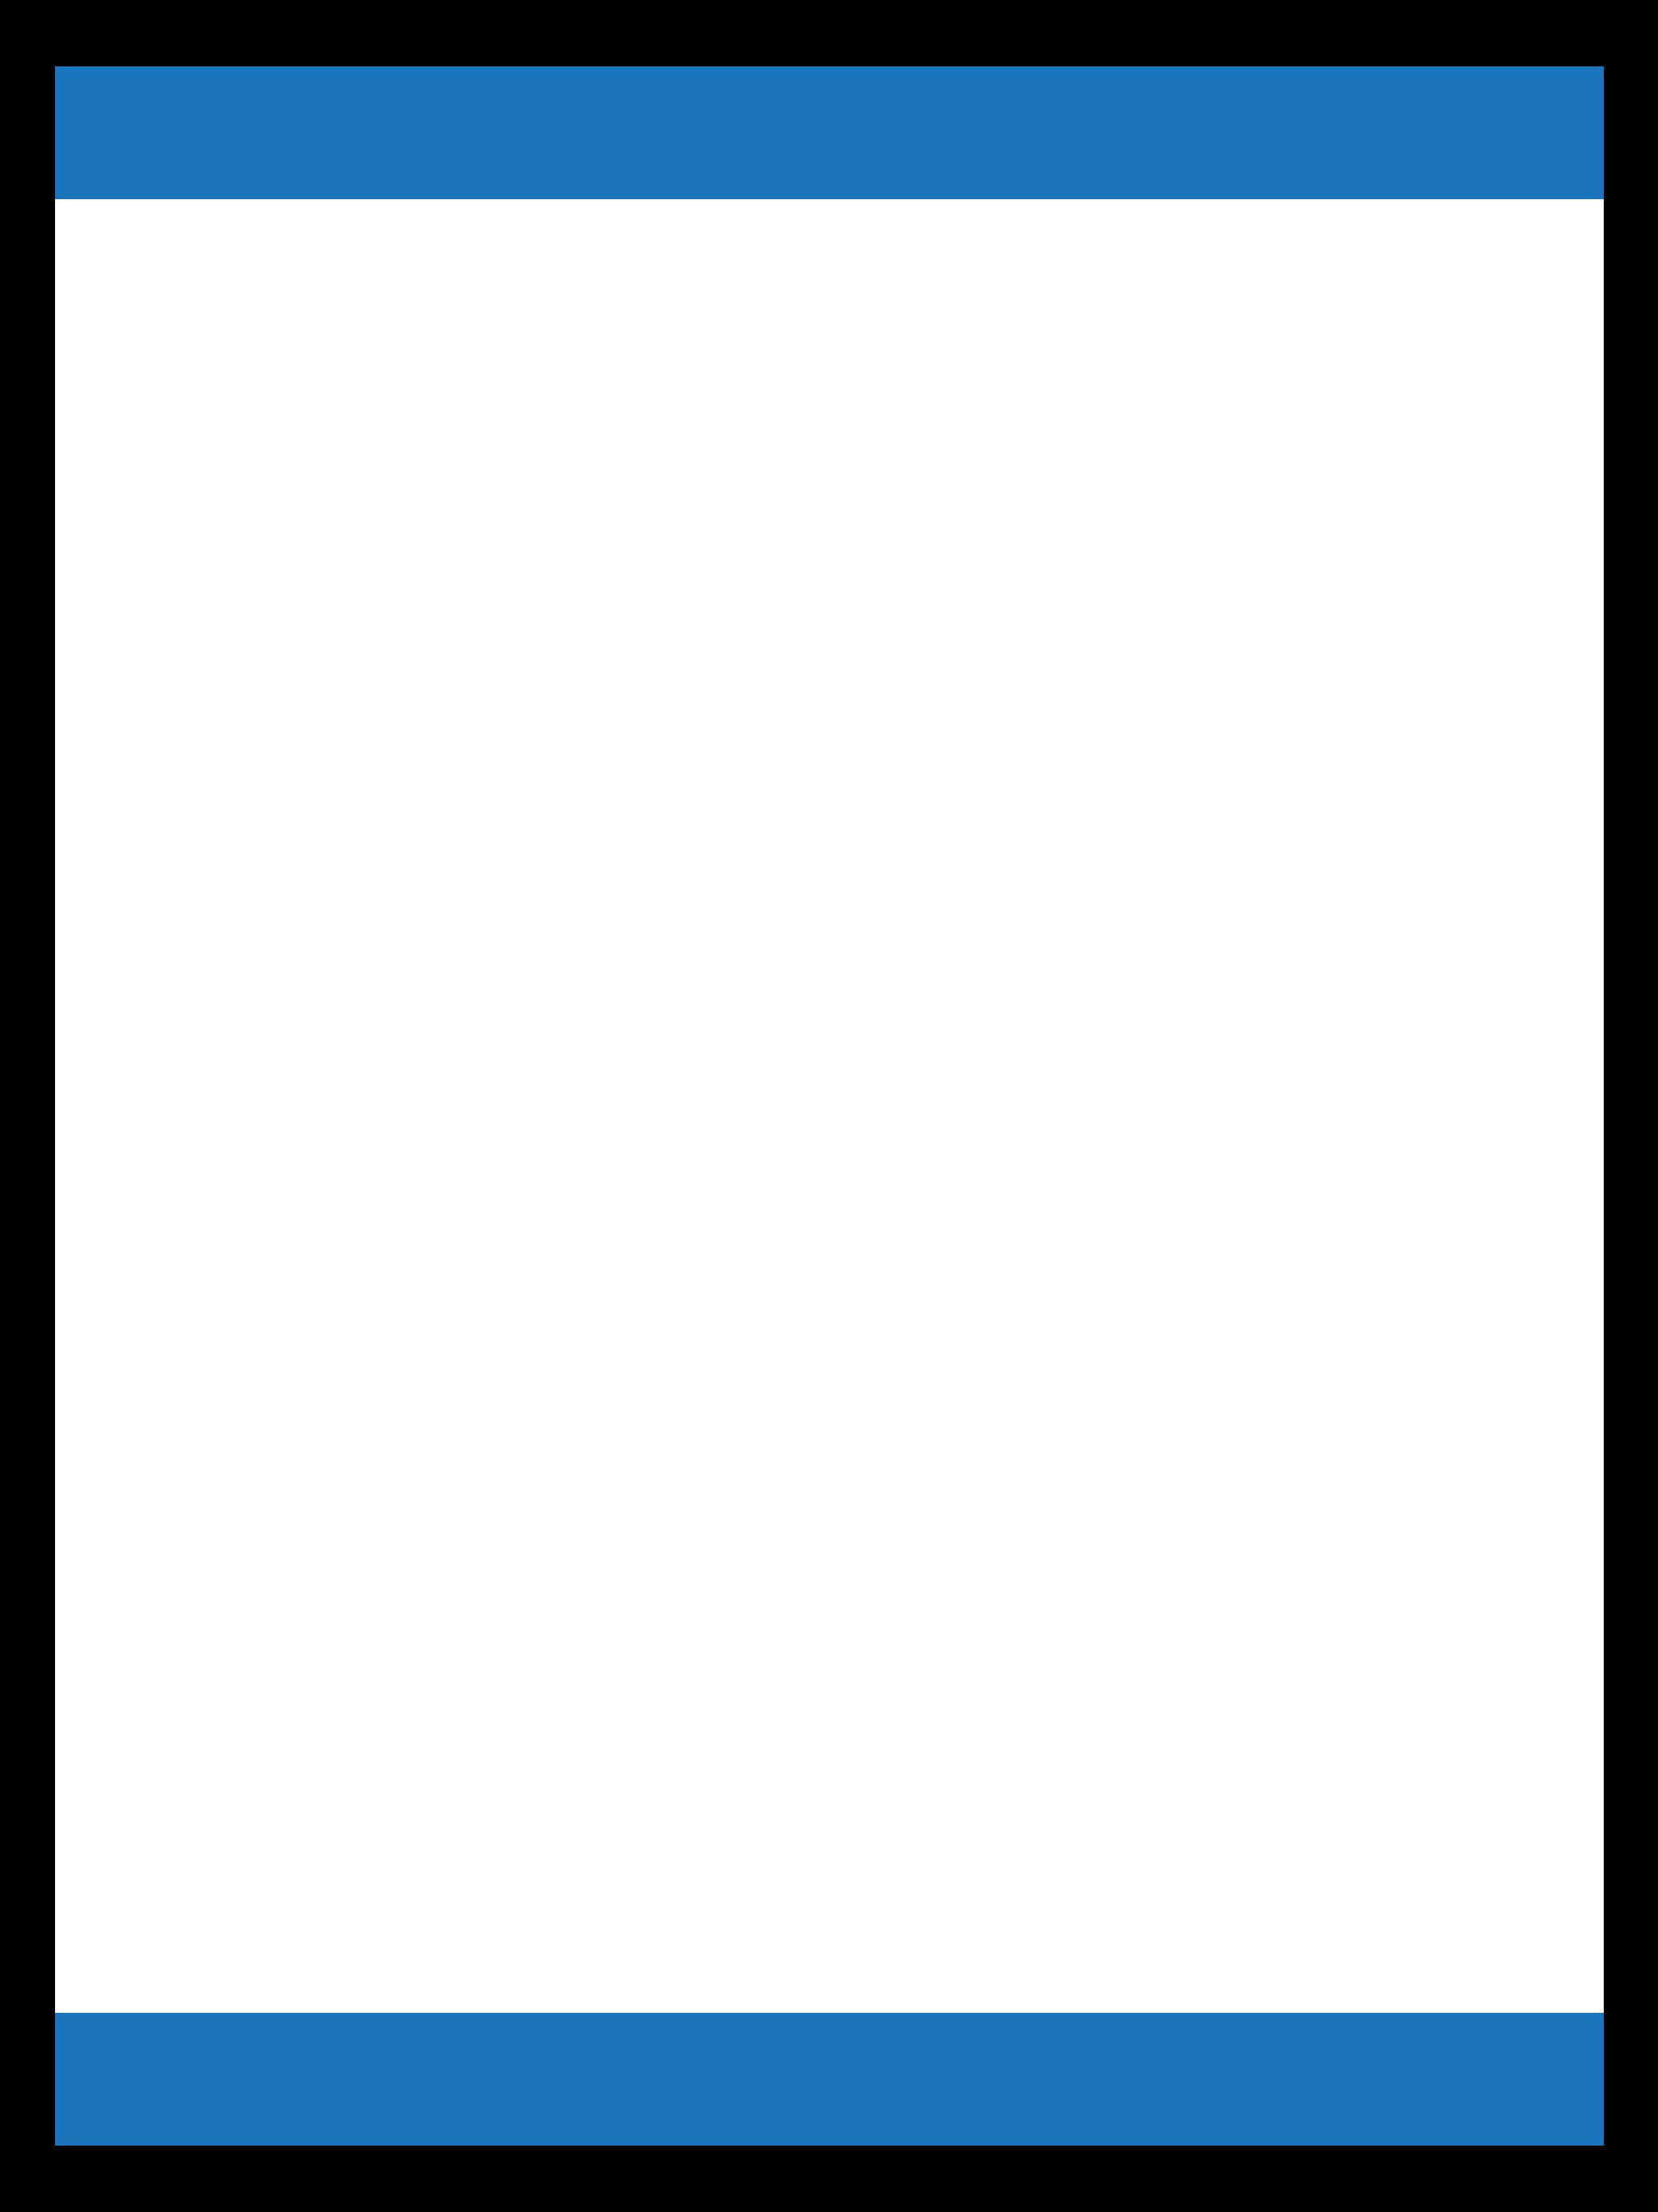 Ipad Vertical_2048x2732_Heart Arrows_Blue.png